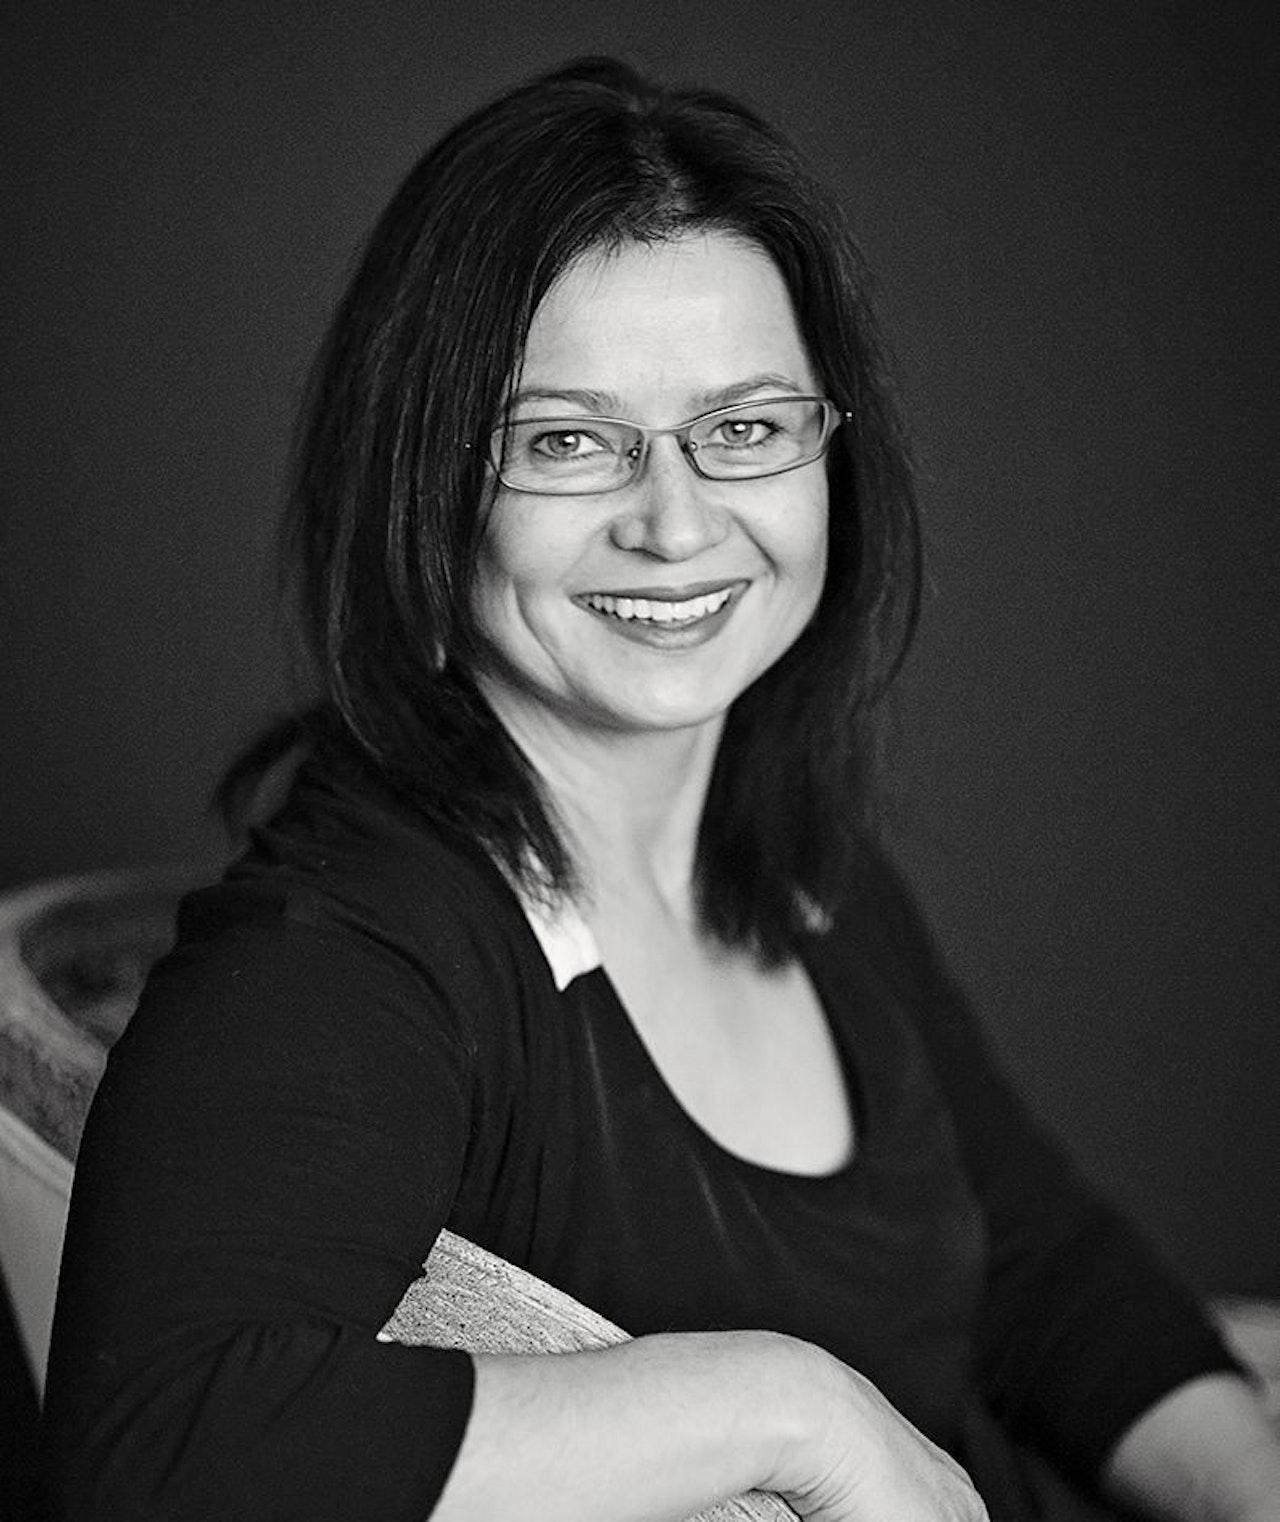 Renata-Buziak-photo-Eva Urbanska-sml